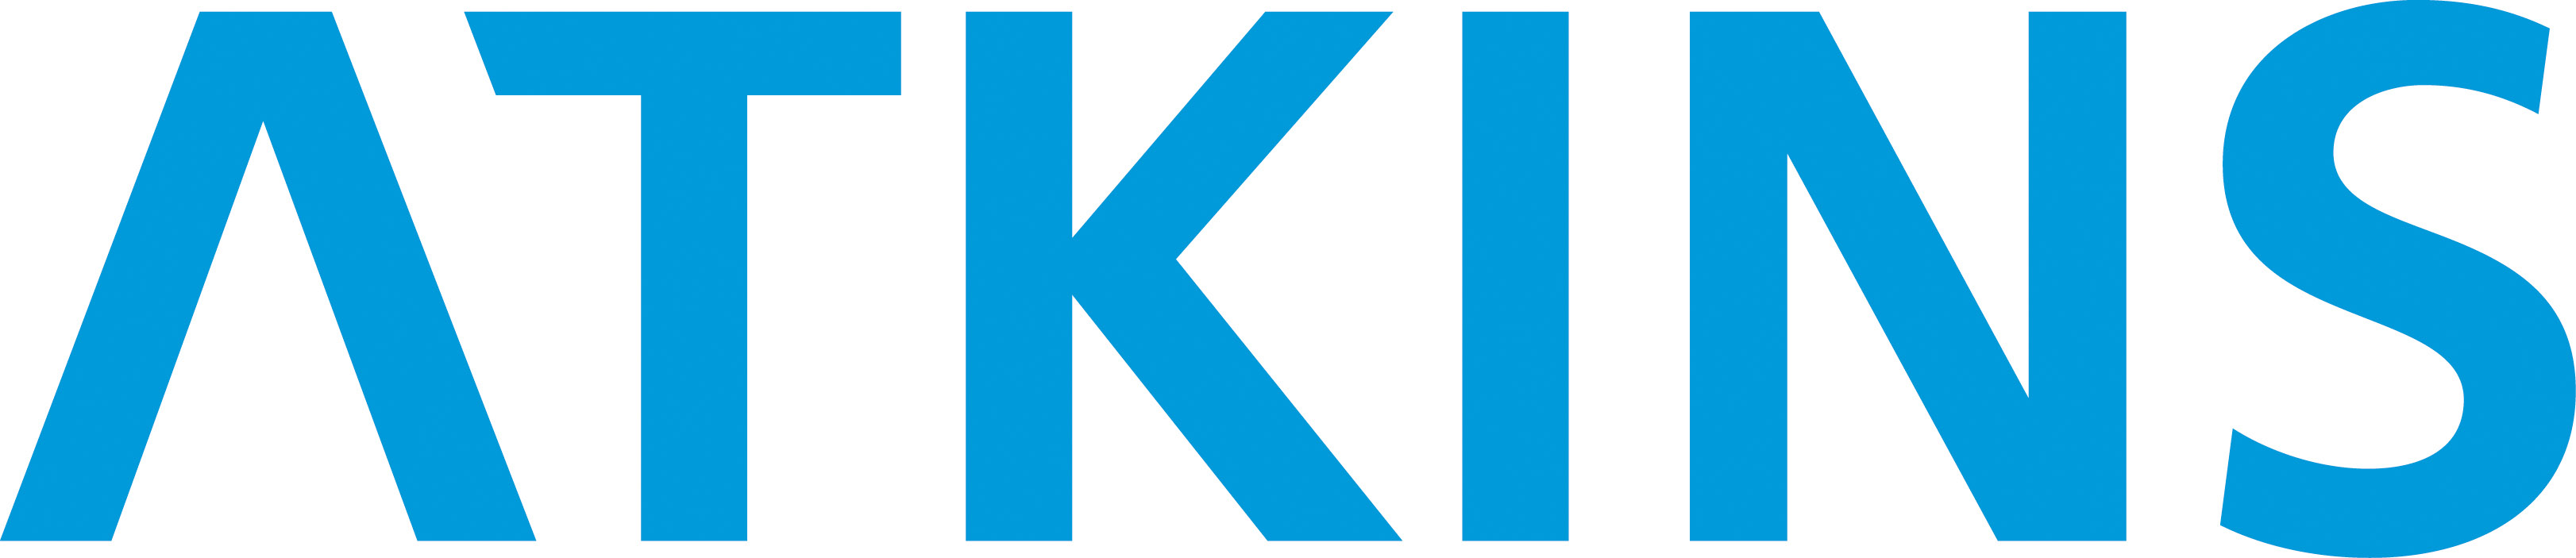 Atkins_logo_Blue